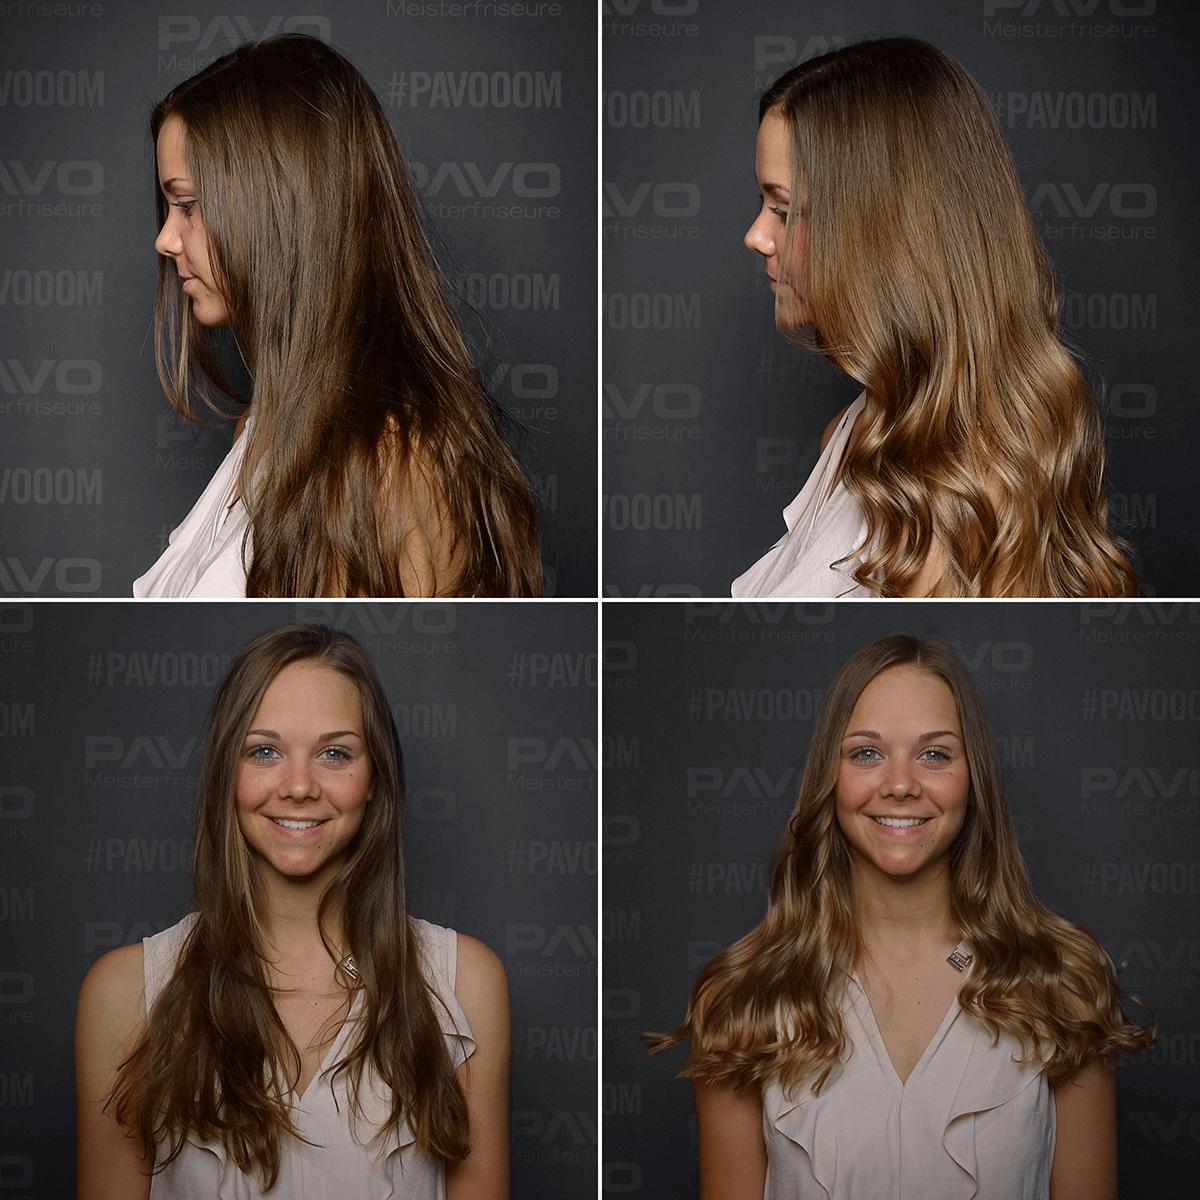 Guter Friseur In Essen Pavo Friseure Sommer Sonne